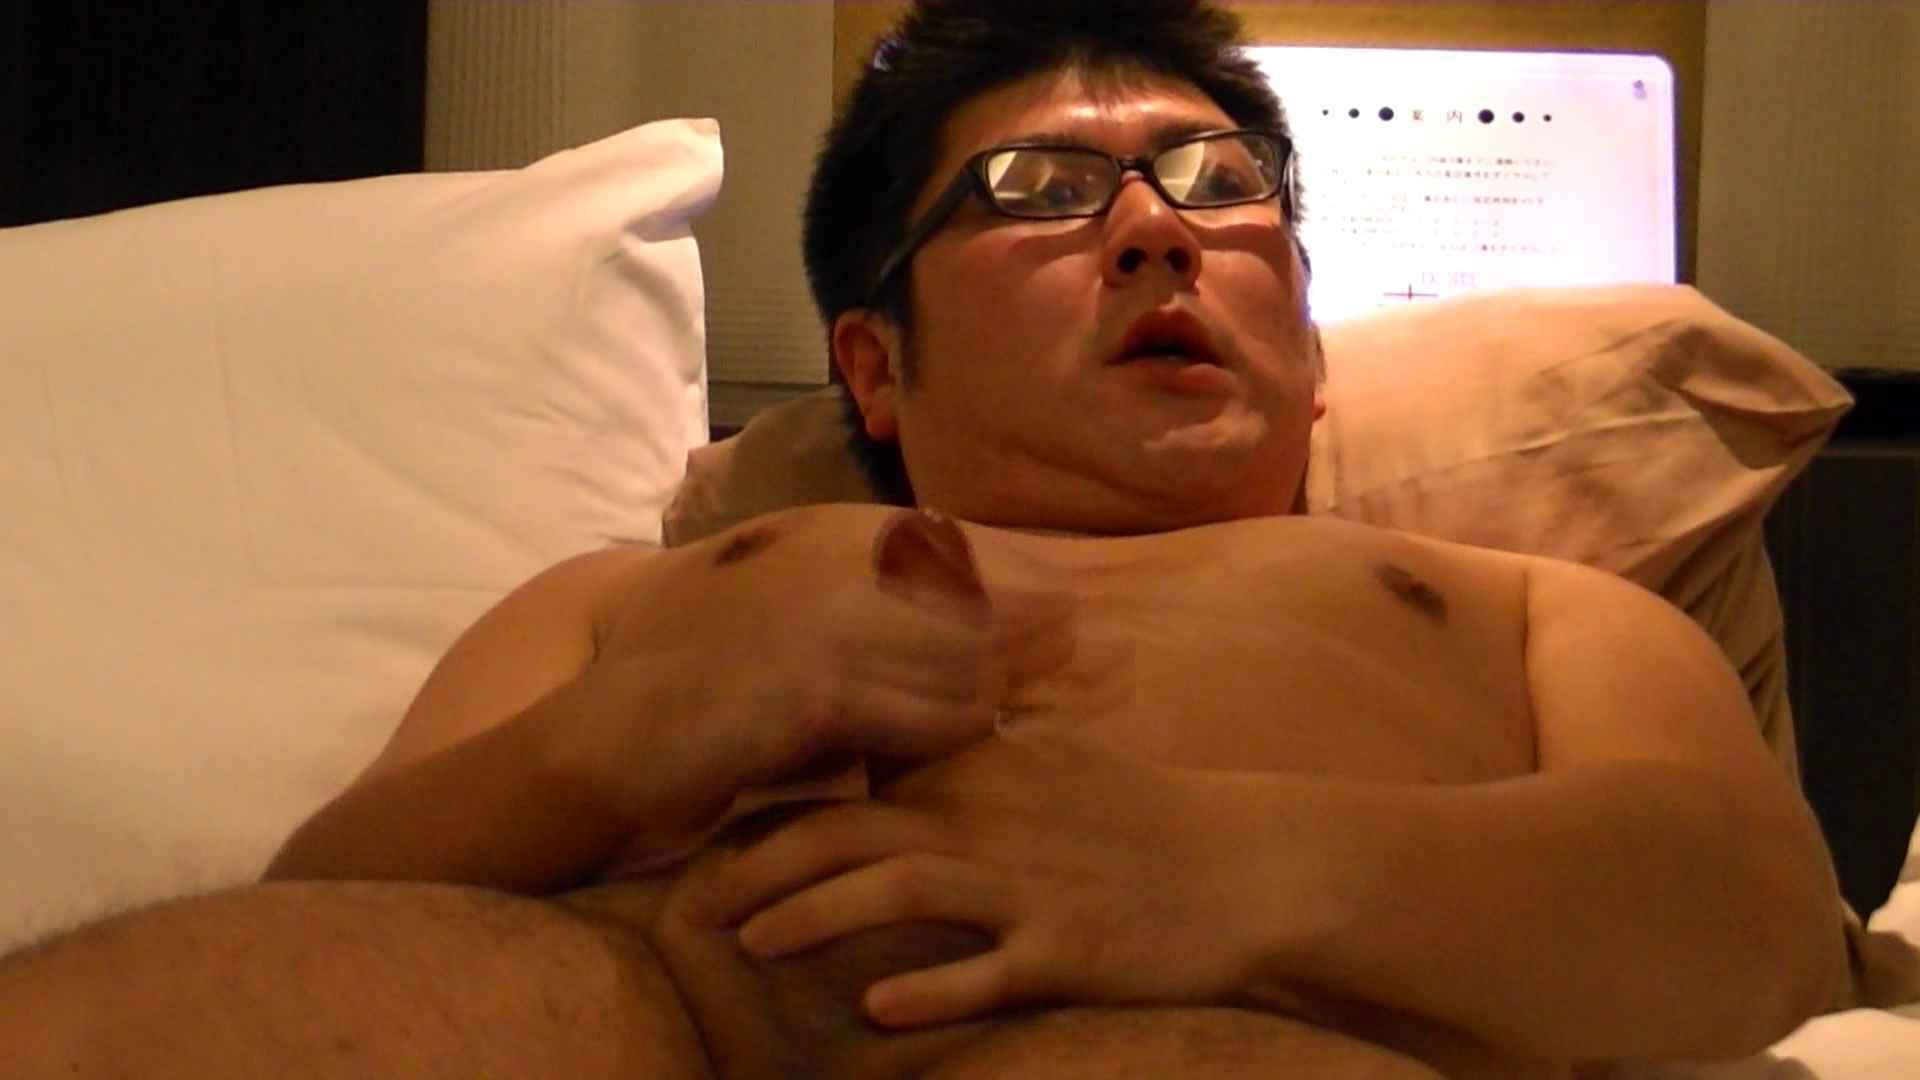 Mr.オナックスさん投稿!HD 貴方のオナニー三万円で撮影させてください。VOL.03 後編 完全無修正でお届け | オナニー特集  83pic 76